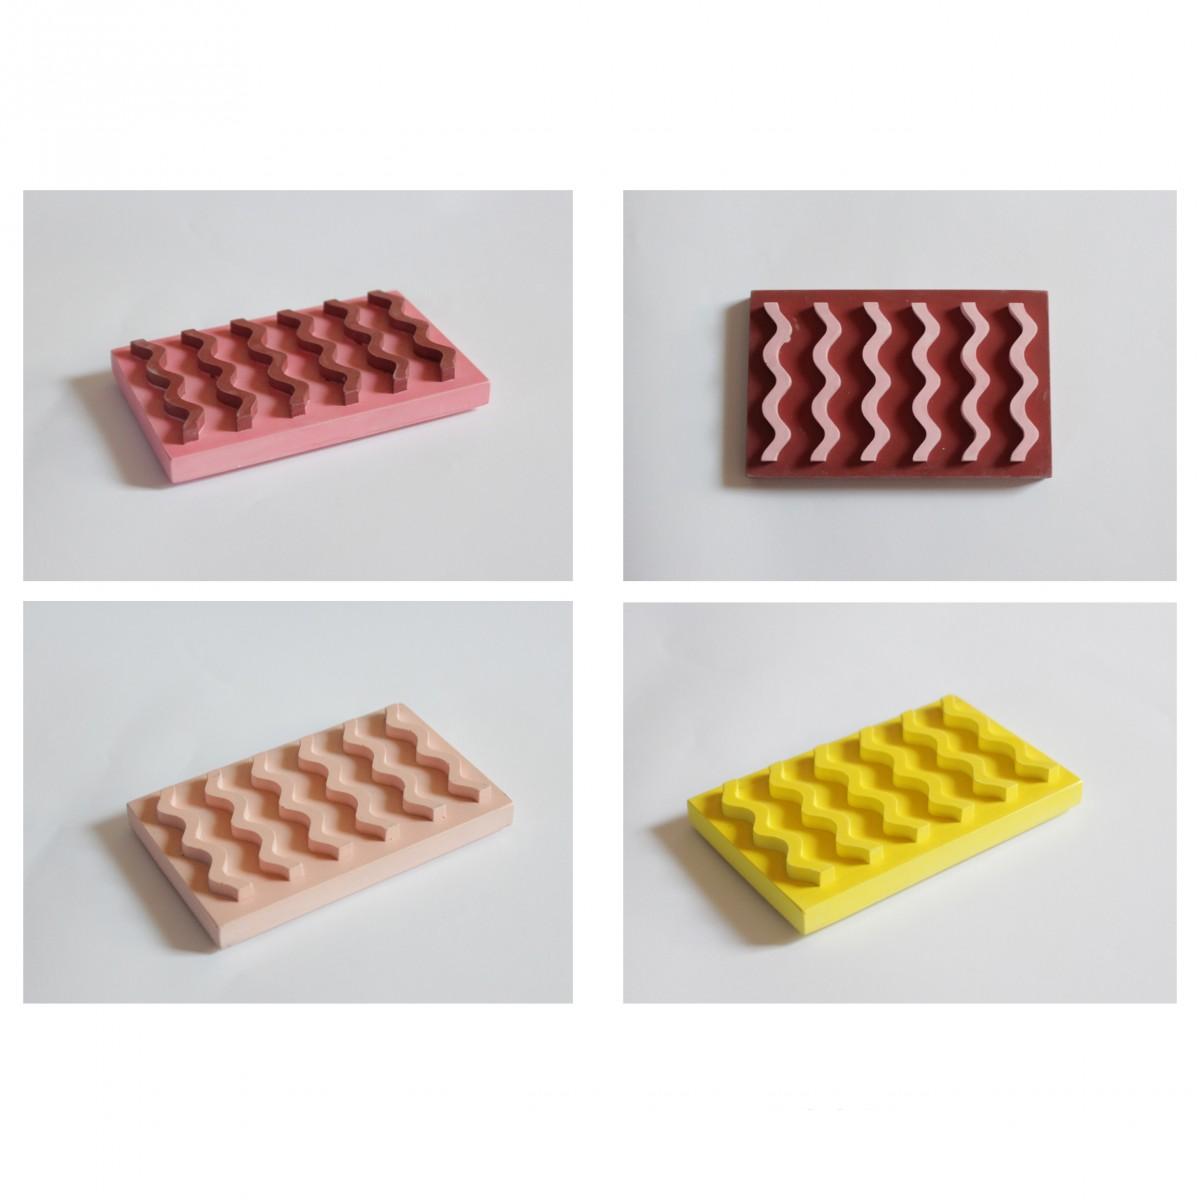 Seifenablage aus Porzellangips / Rot-rosa / objet vague